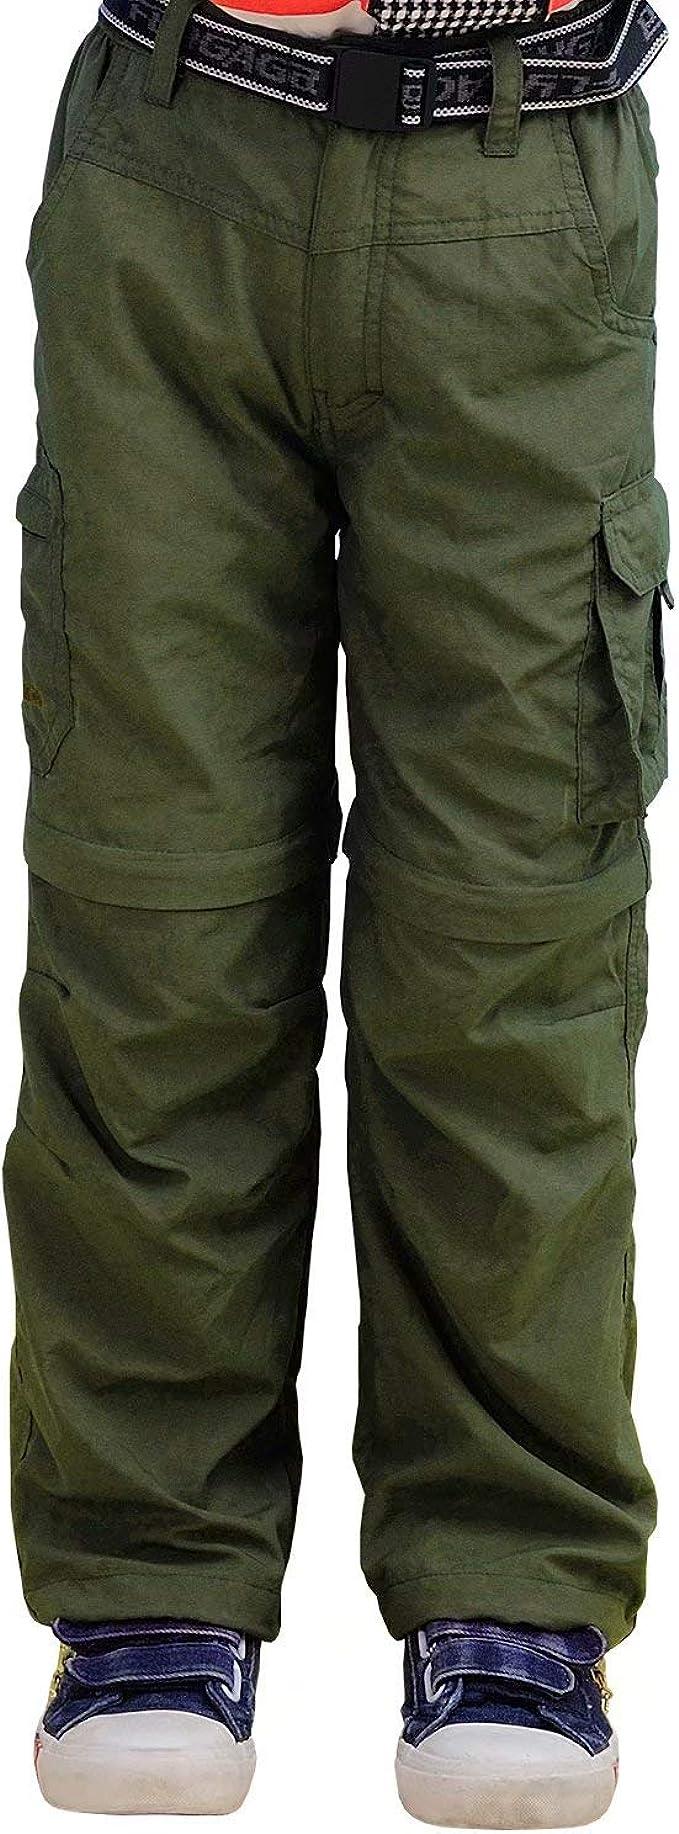 JOMLUN Boy/'s Casual Quick Dry Outdoor Pants Hiking Climbing Trouser Zip Off Pants Kids Cargo Pants